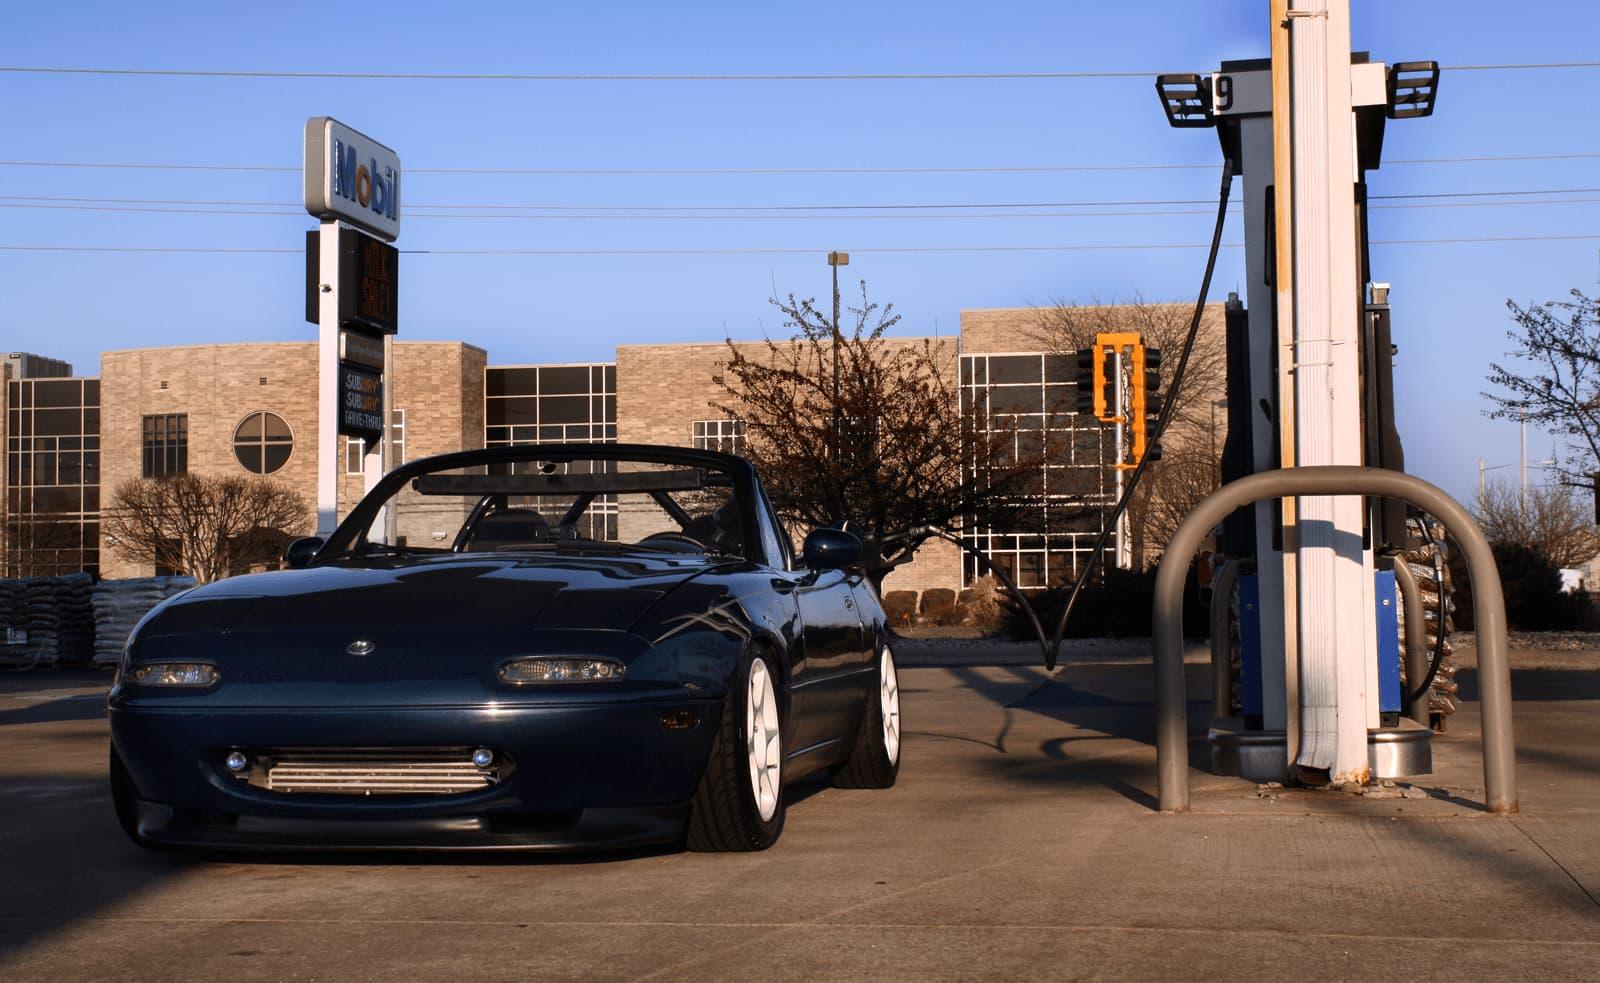 Mazda Miata filling up at the gas station